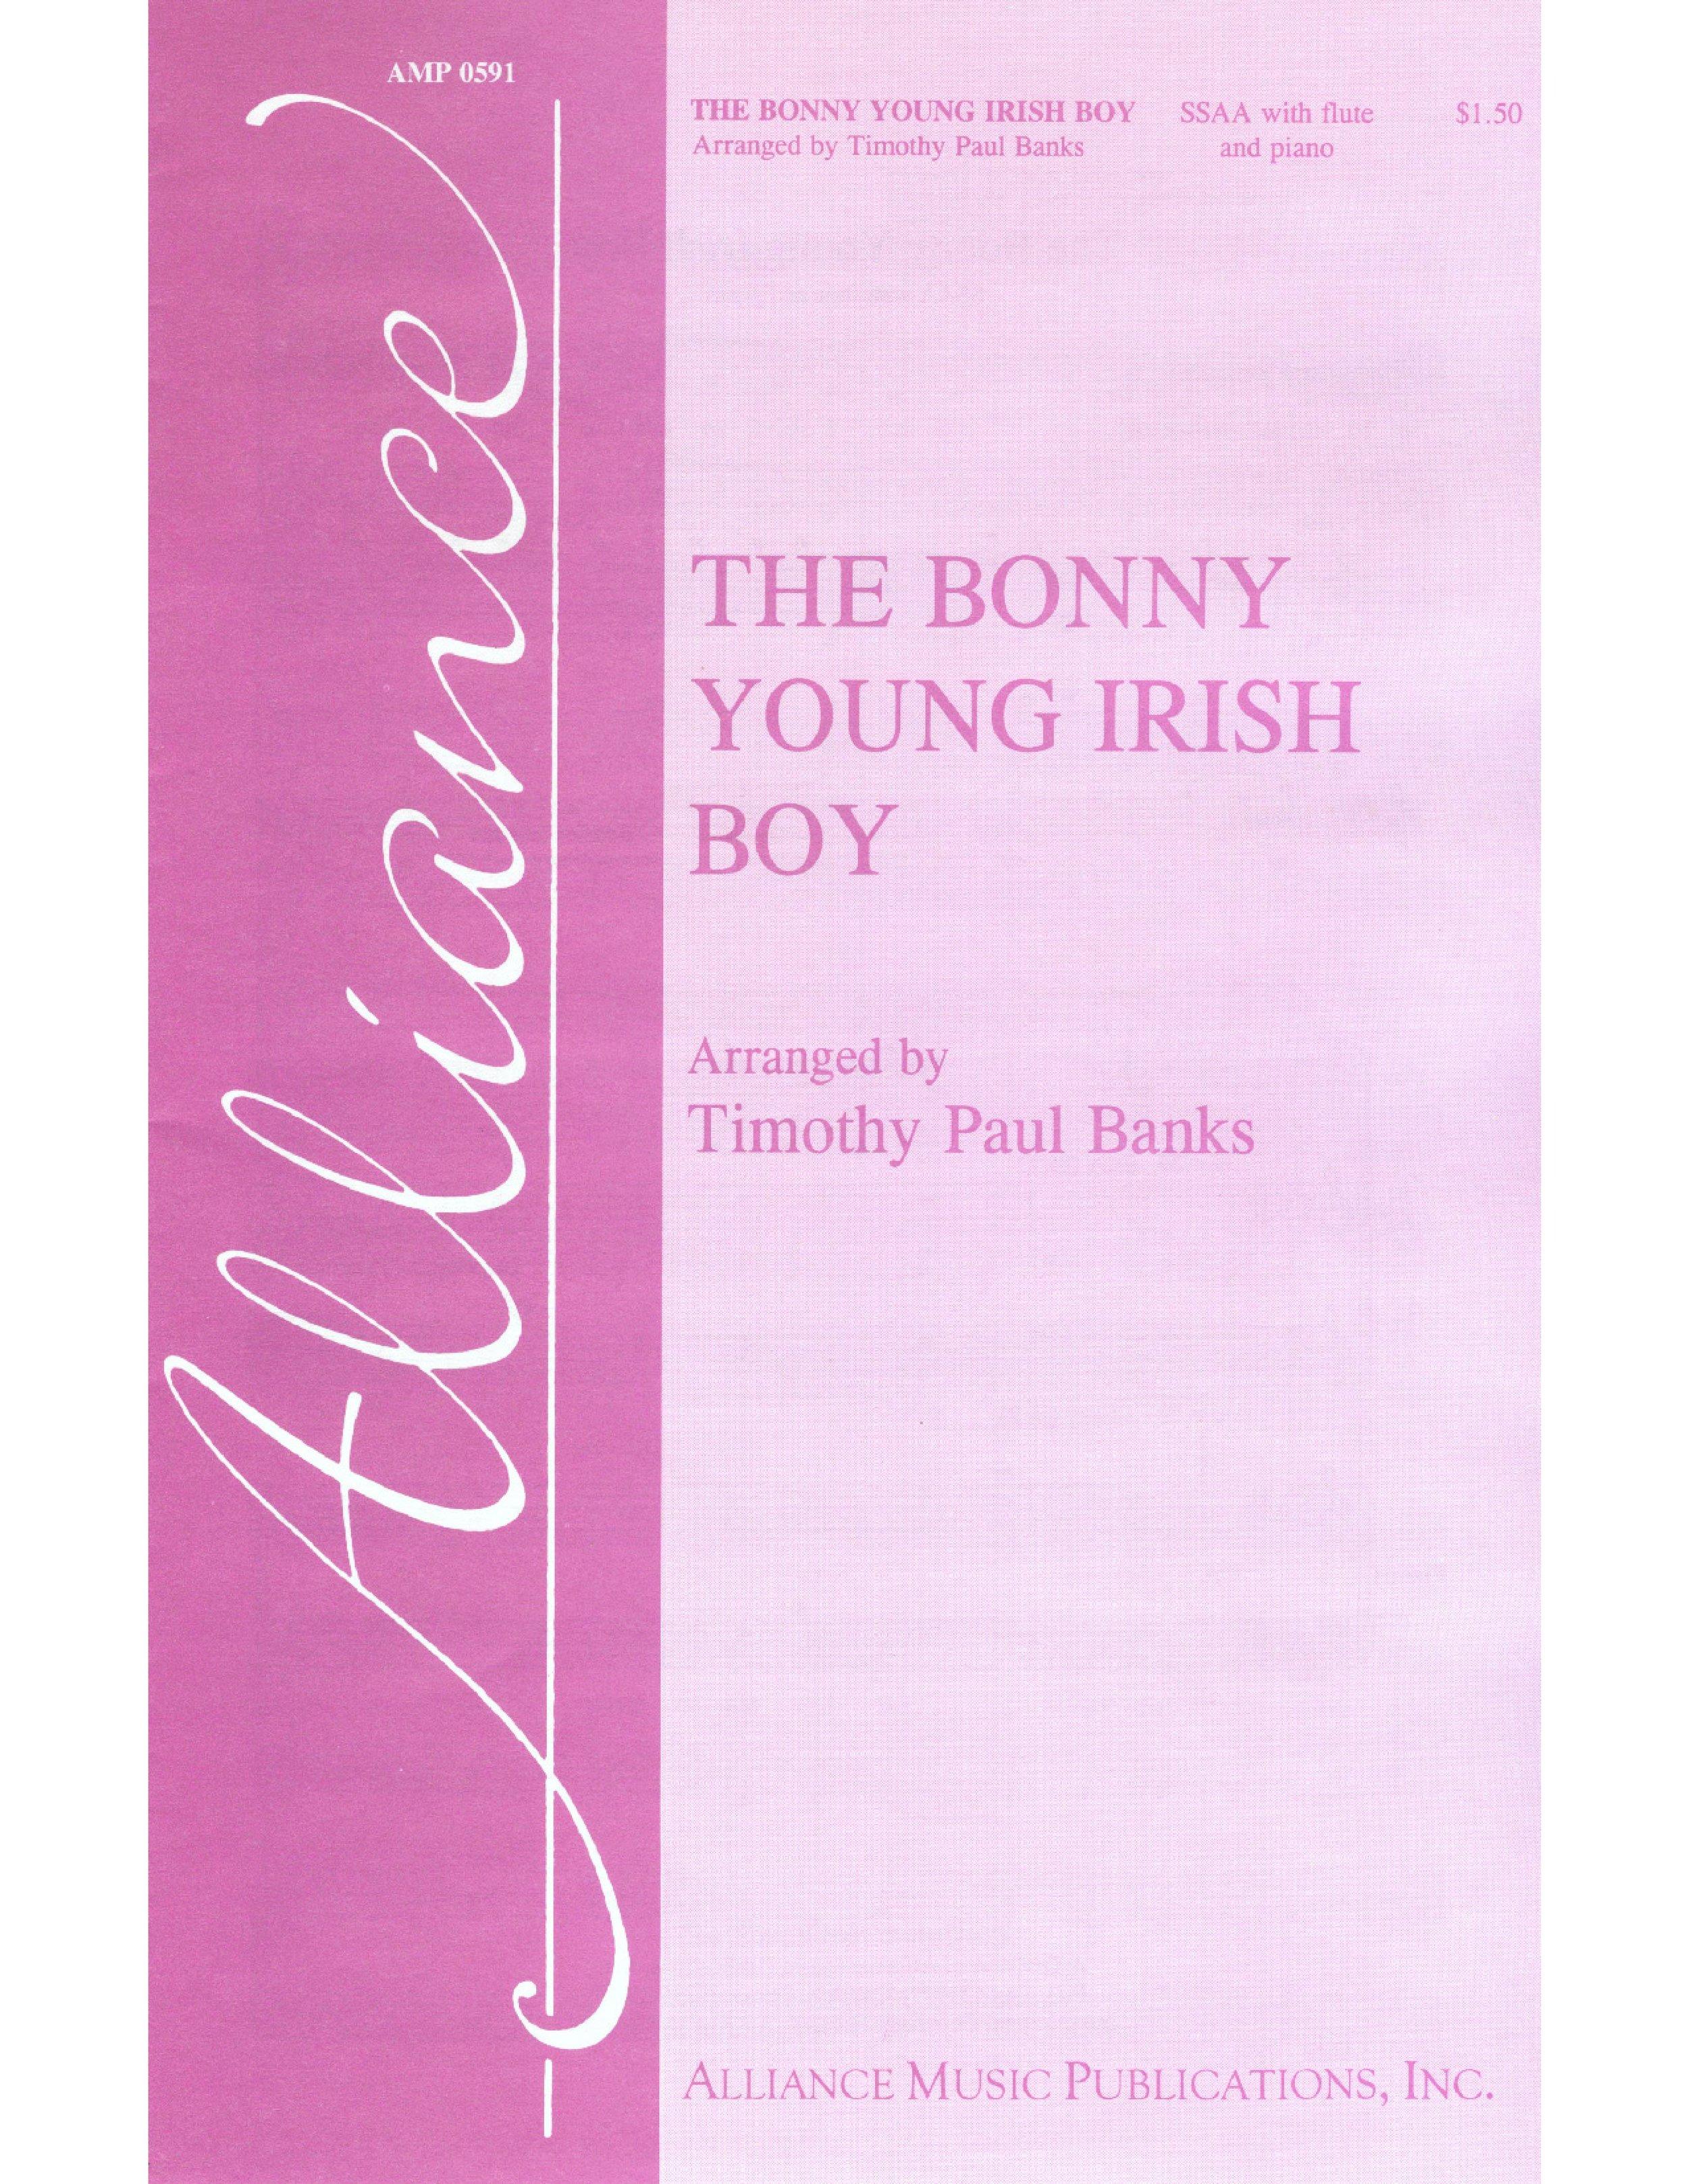 The Bonny Young Irish Boy